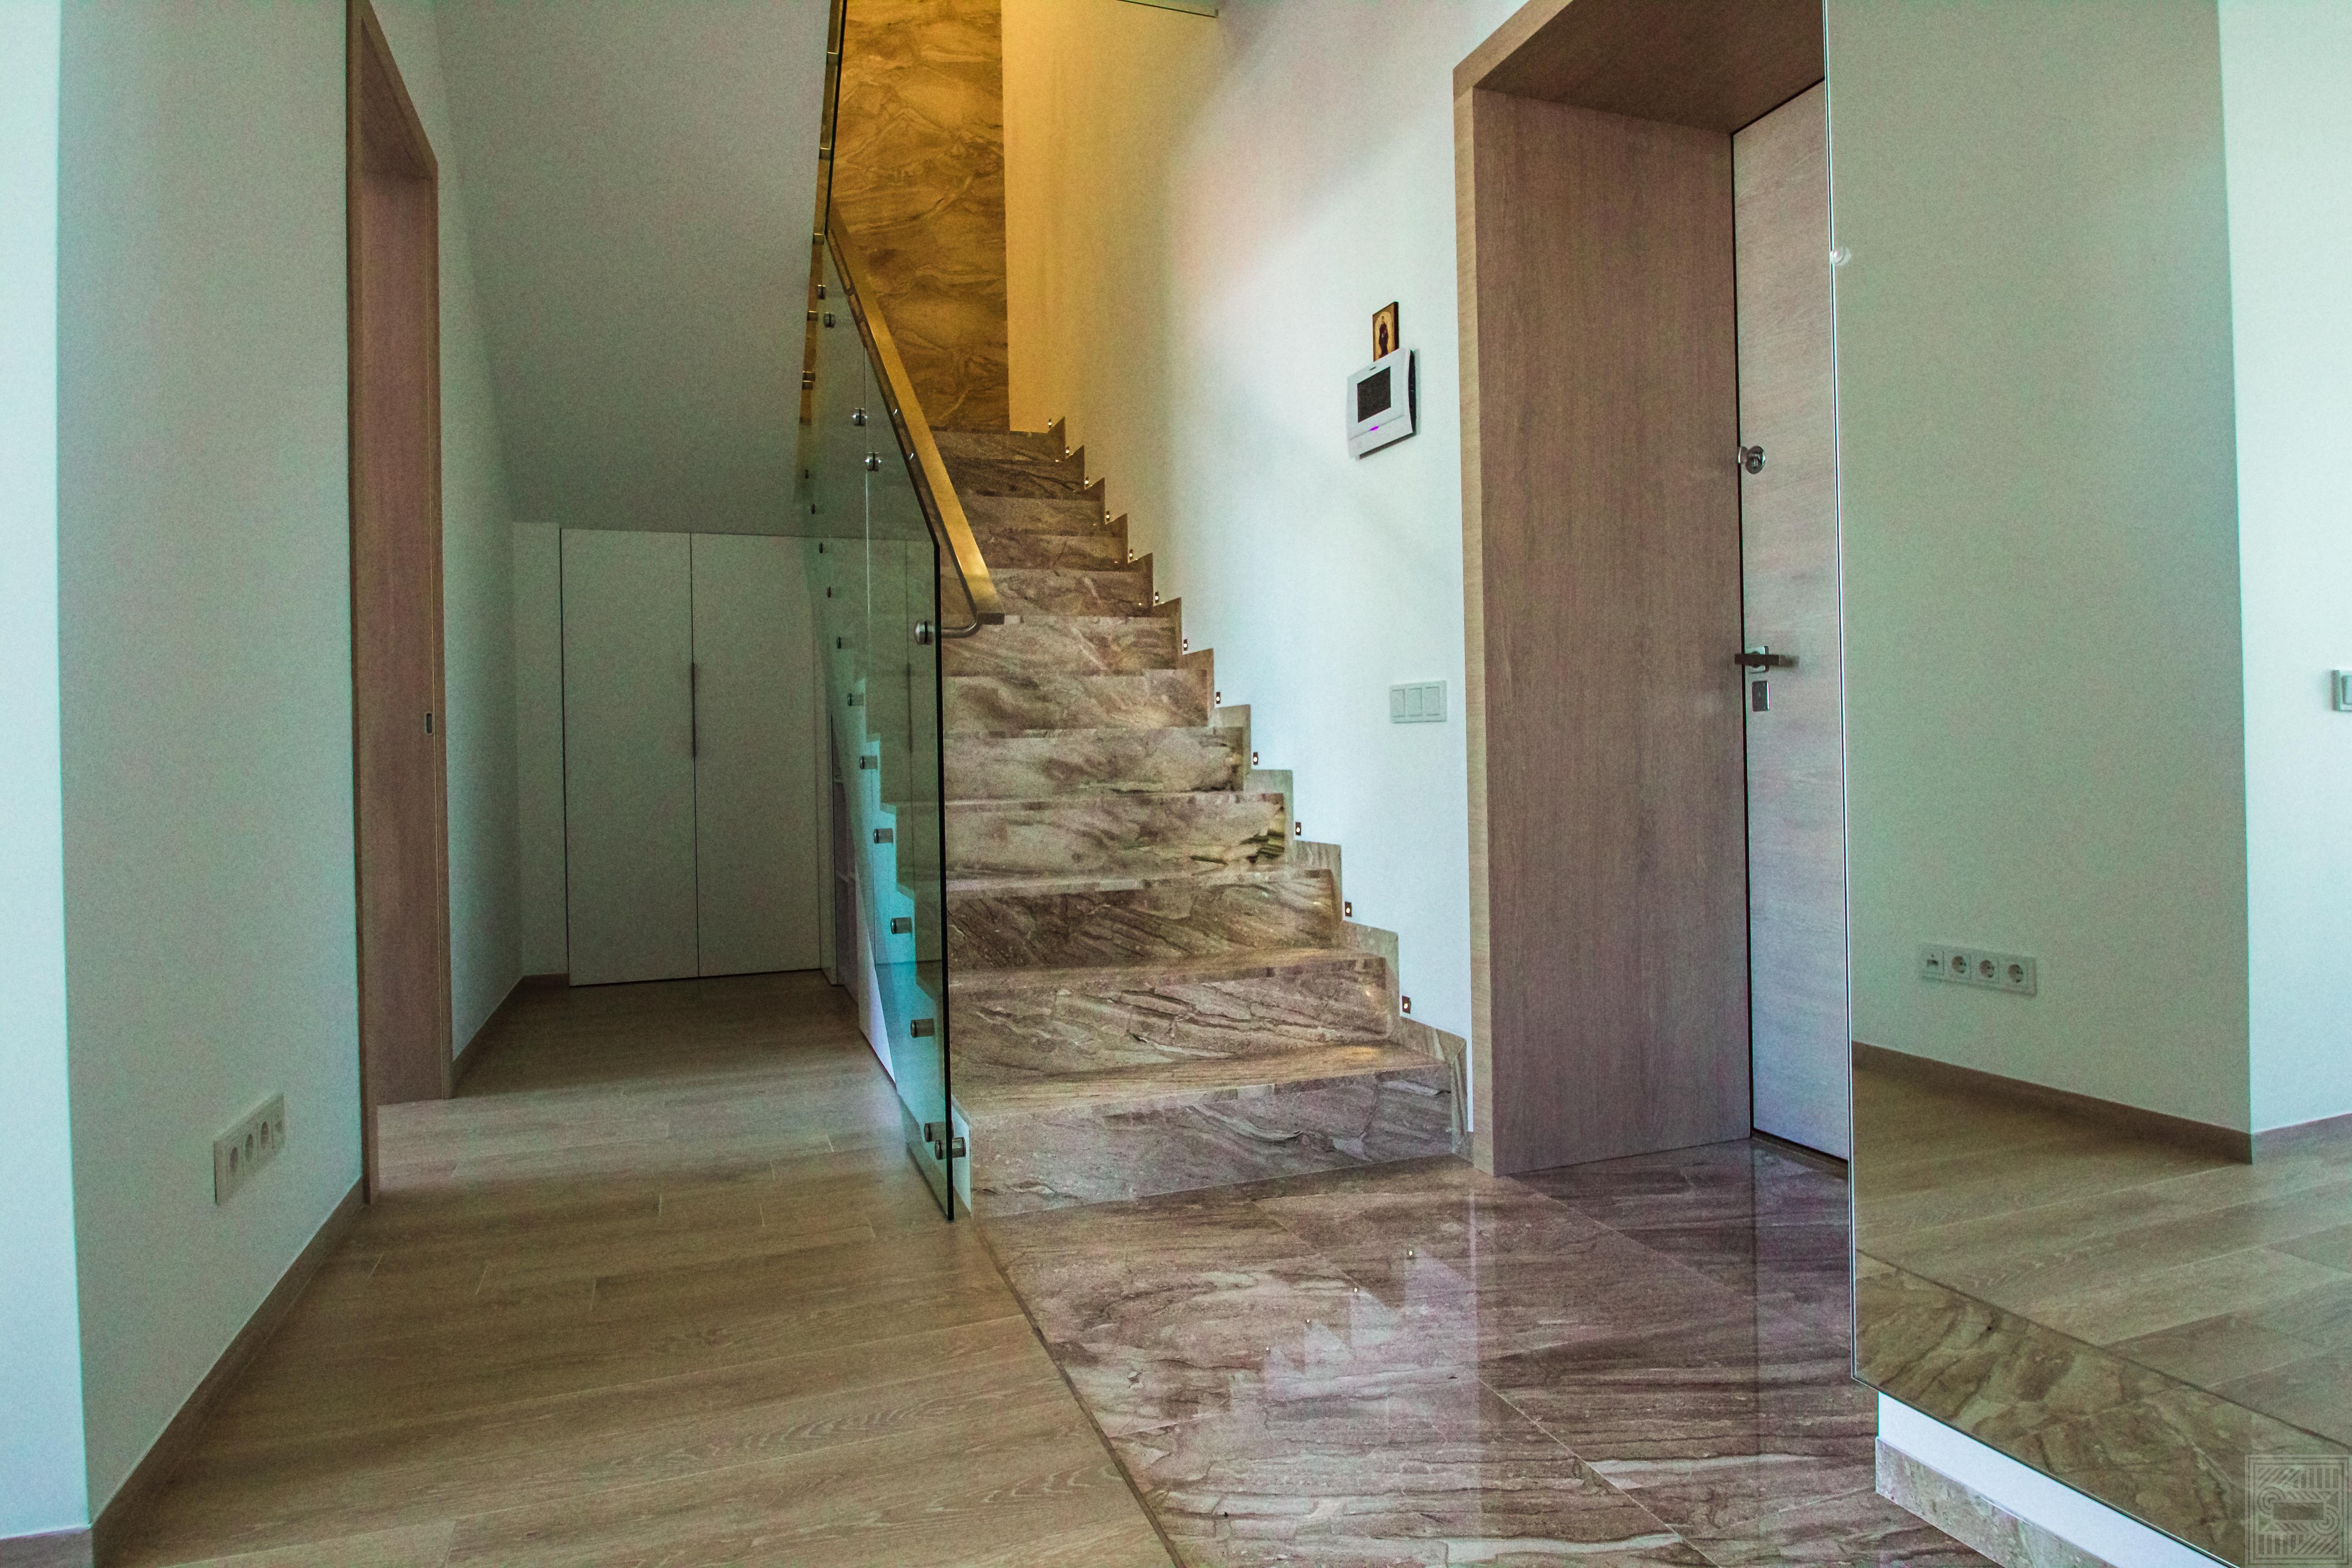 Лестница из мрамора Daino 20 мм stair-marble - Lestnitsa iz mramora Daino 20 mm